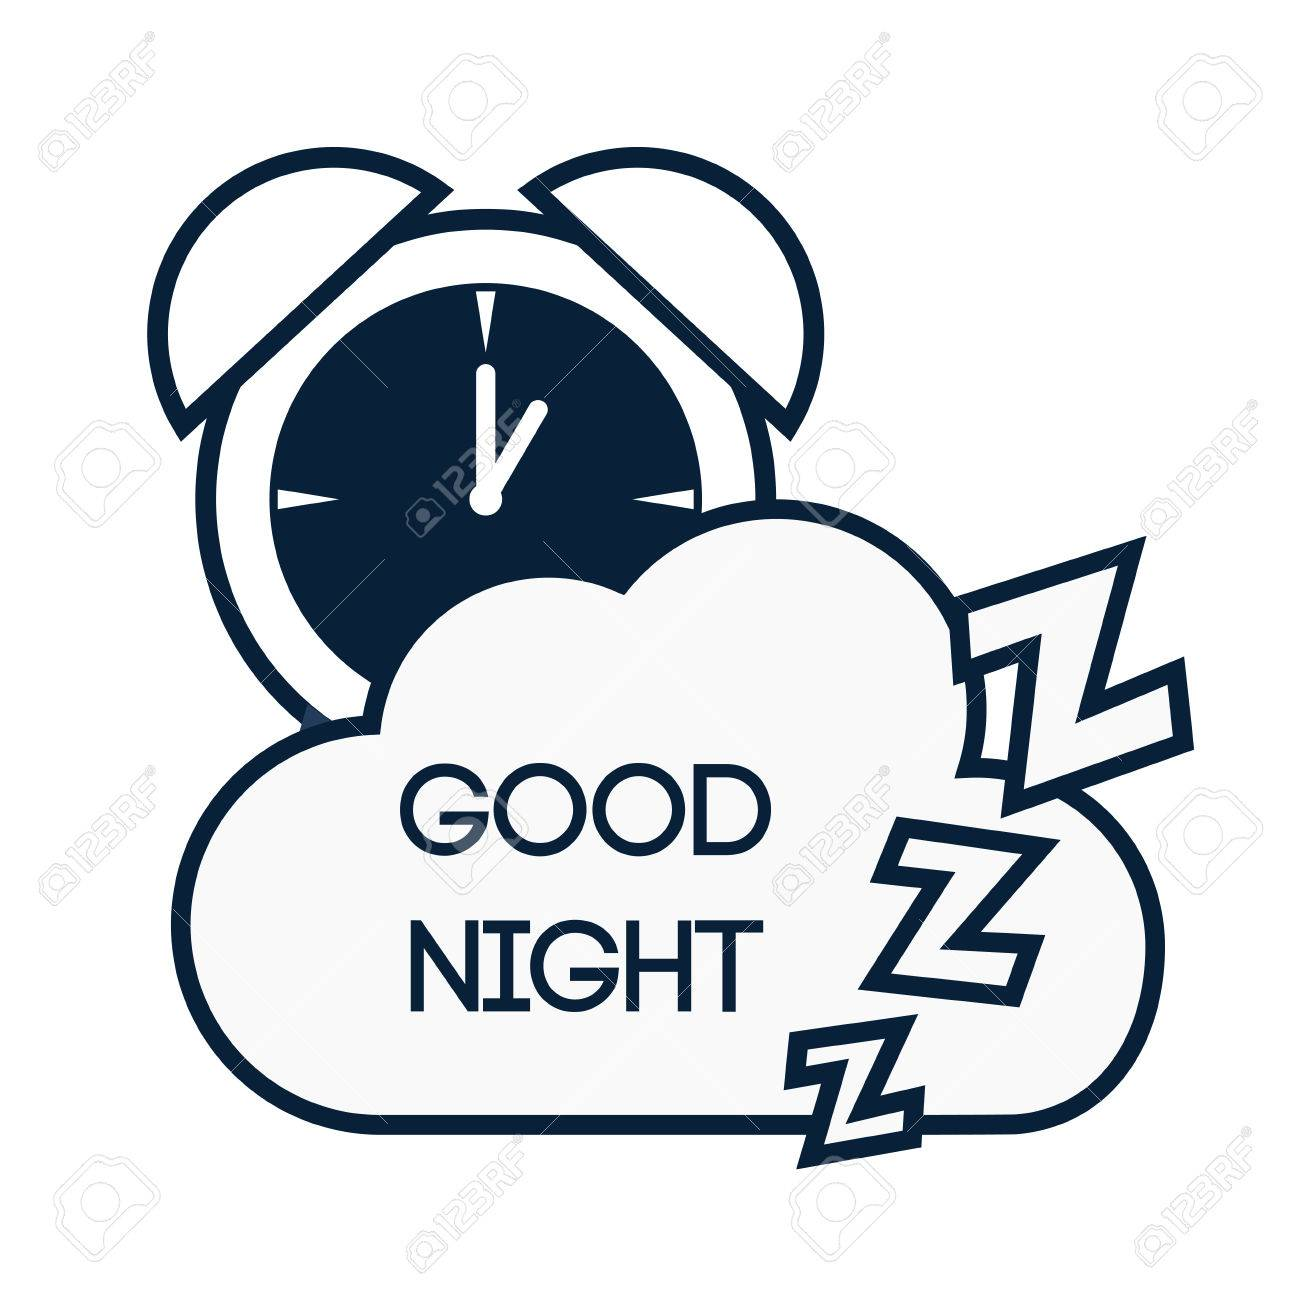 Good Night Digital Design Royalty Free Cliparts Vectors And Stock